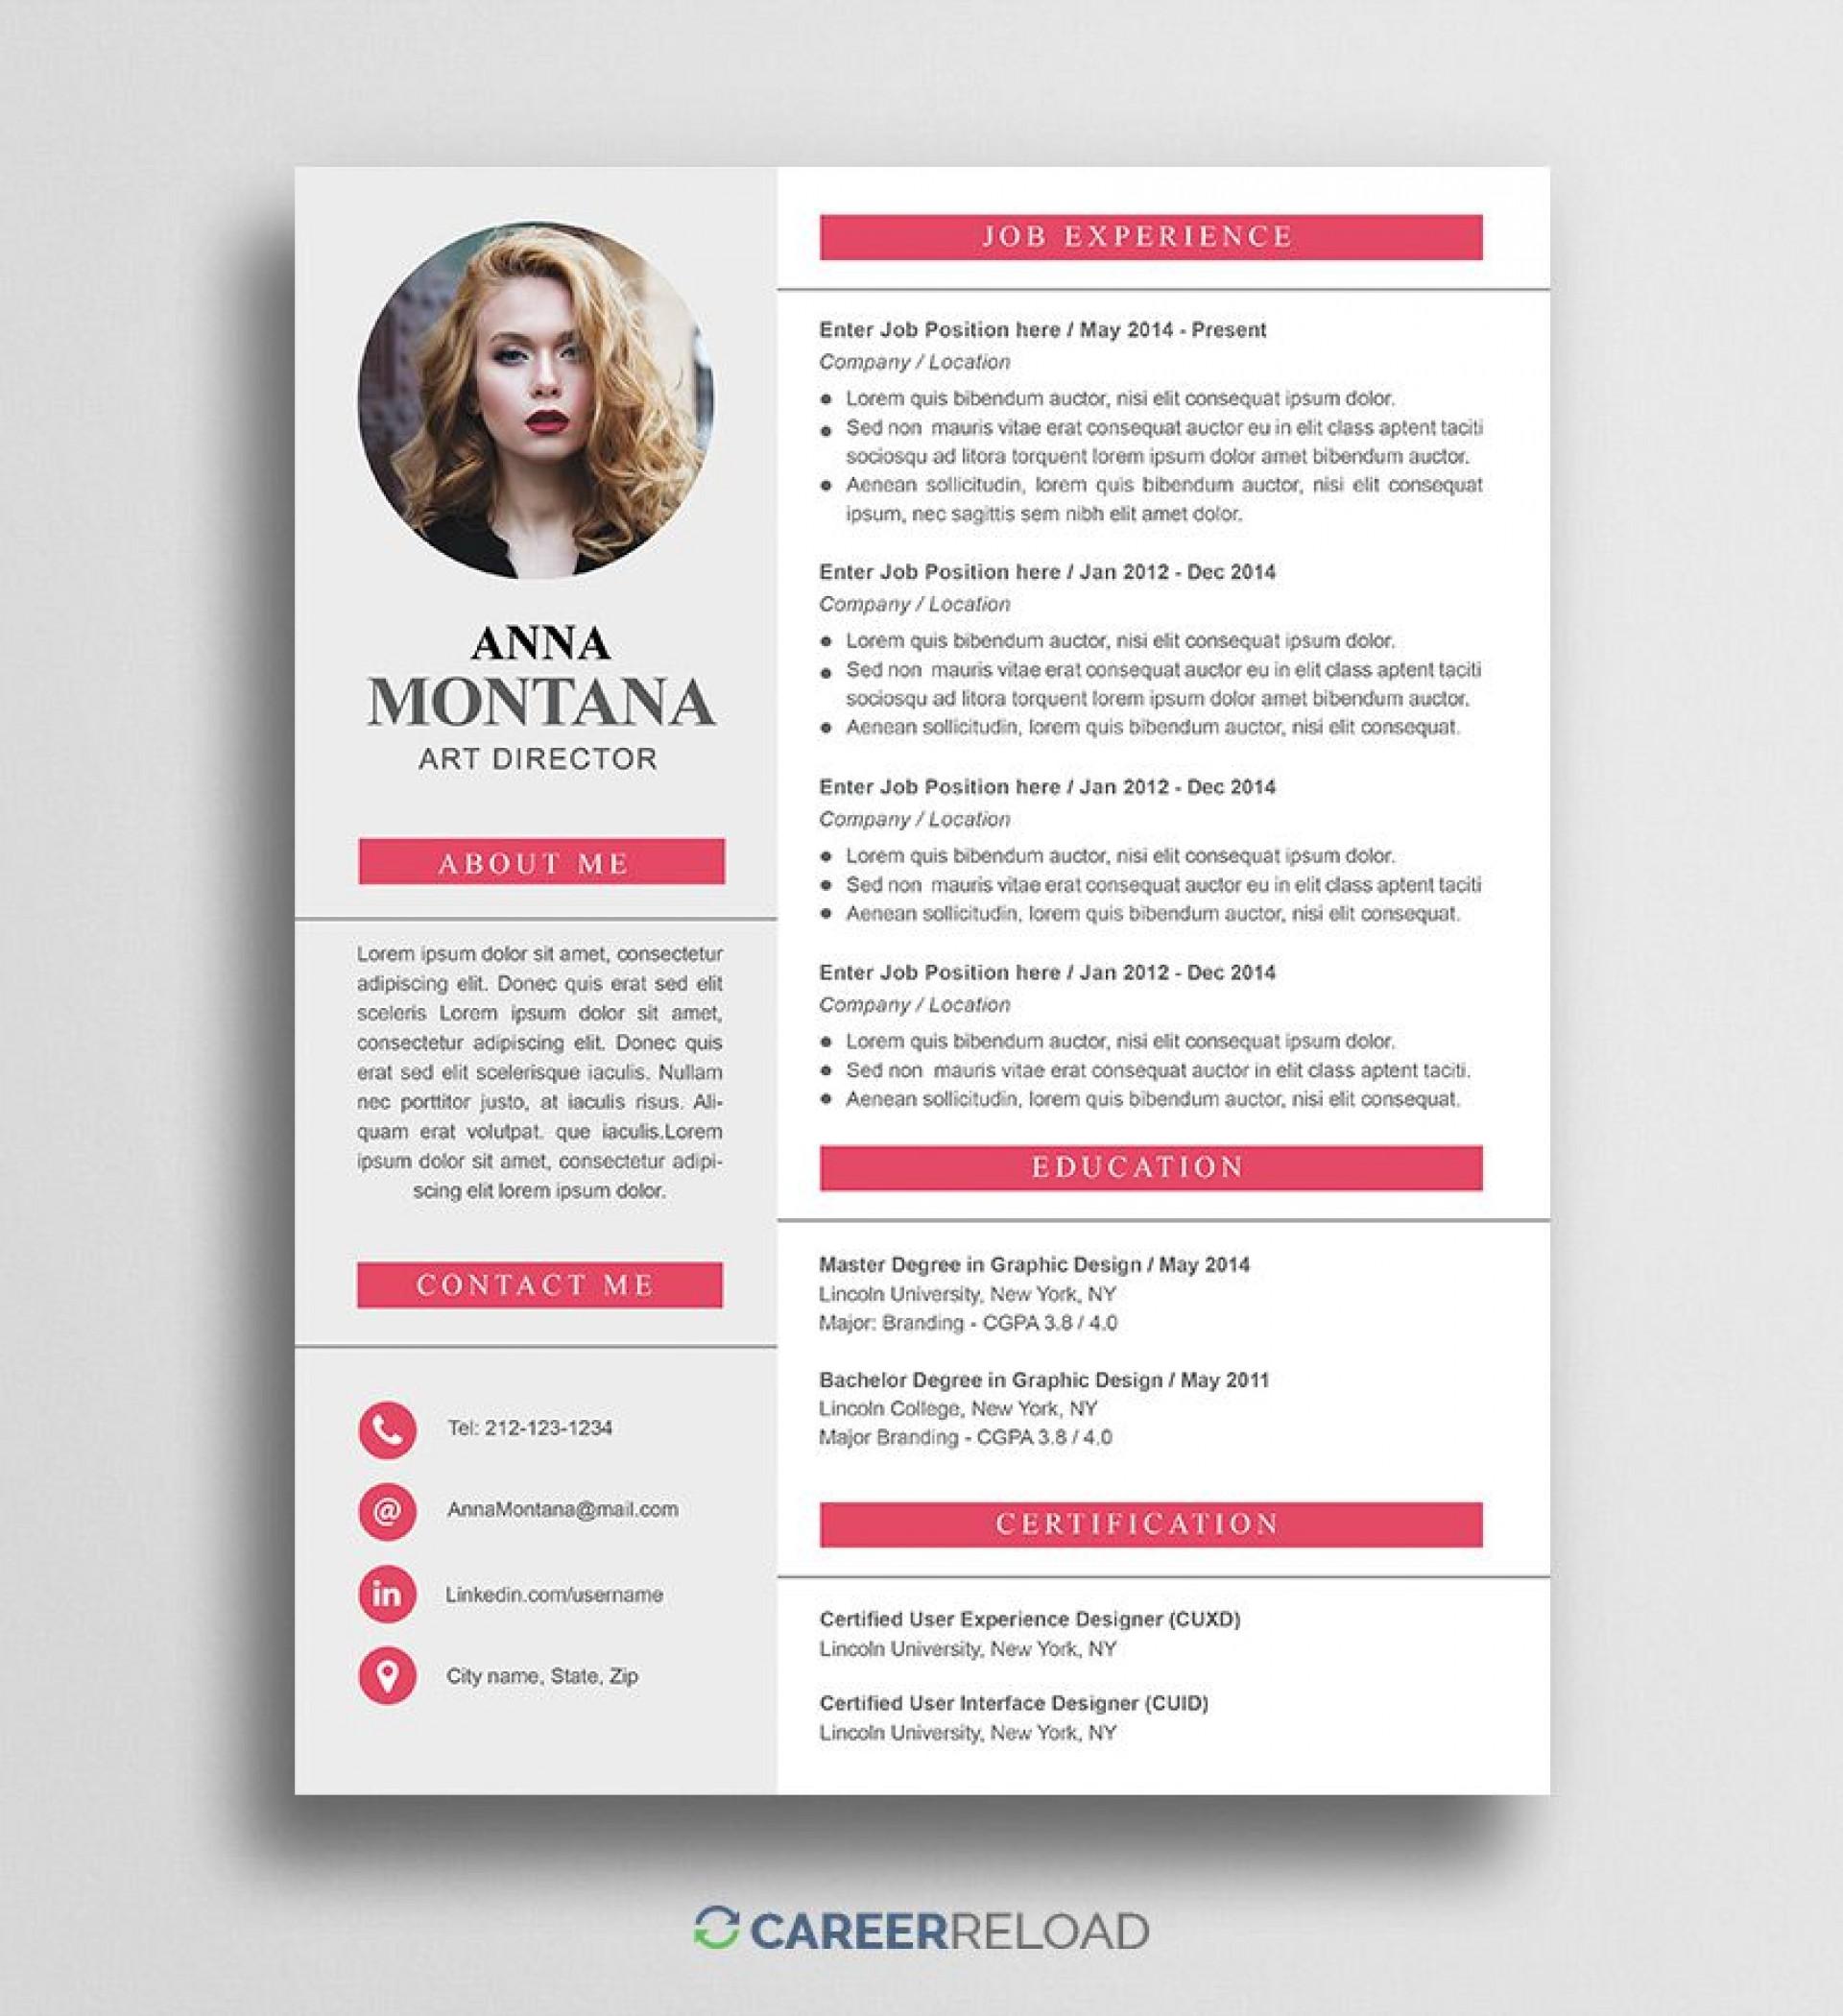 009 Impressive Psd Resume Template Free Download Photo  Graphic Designer Creative Cv1920